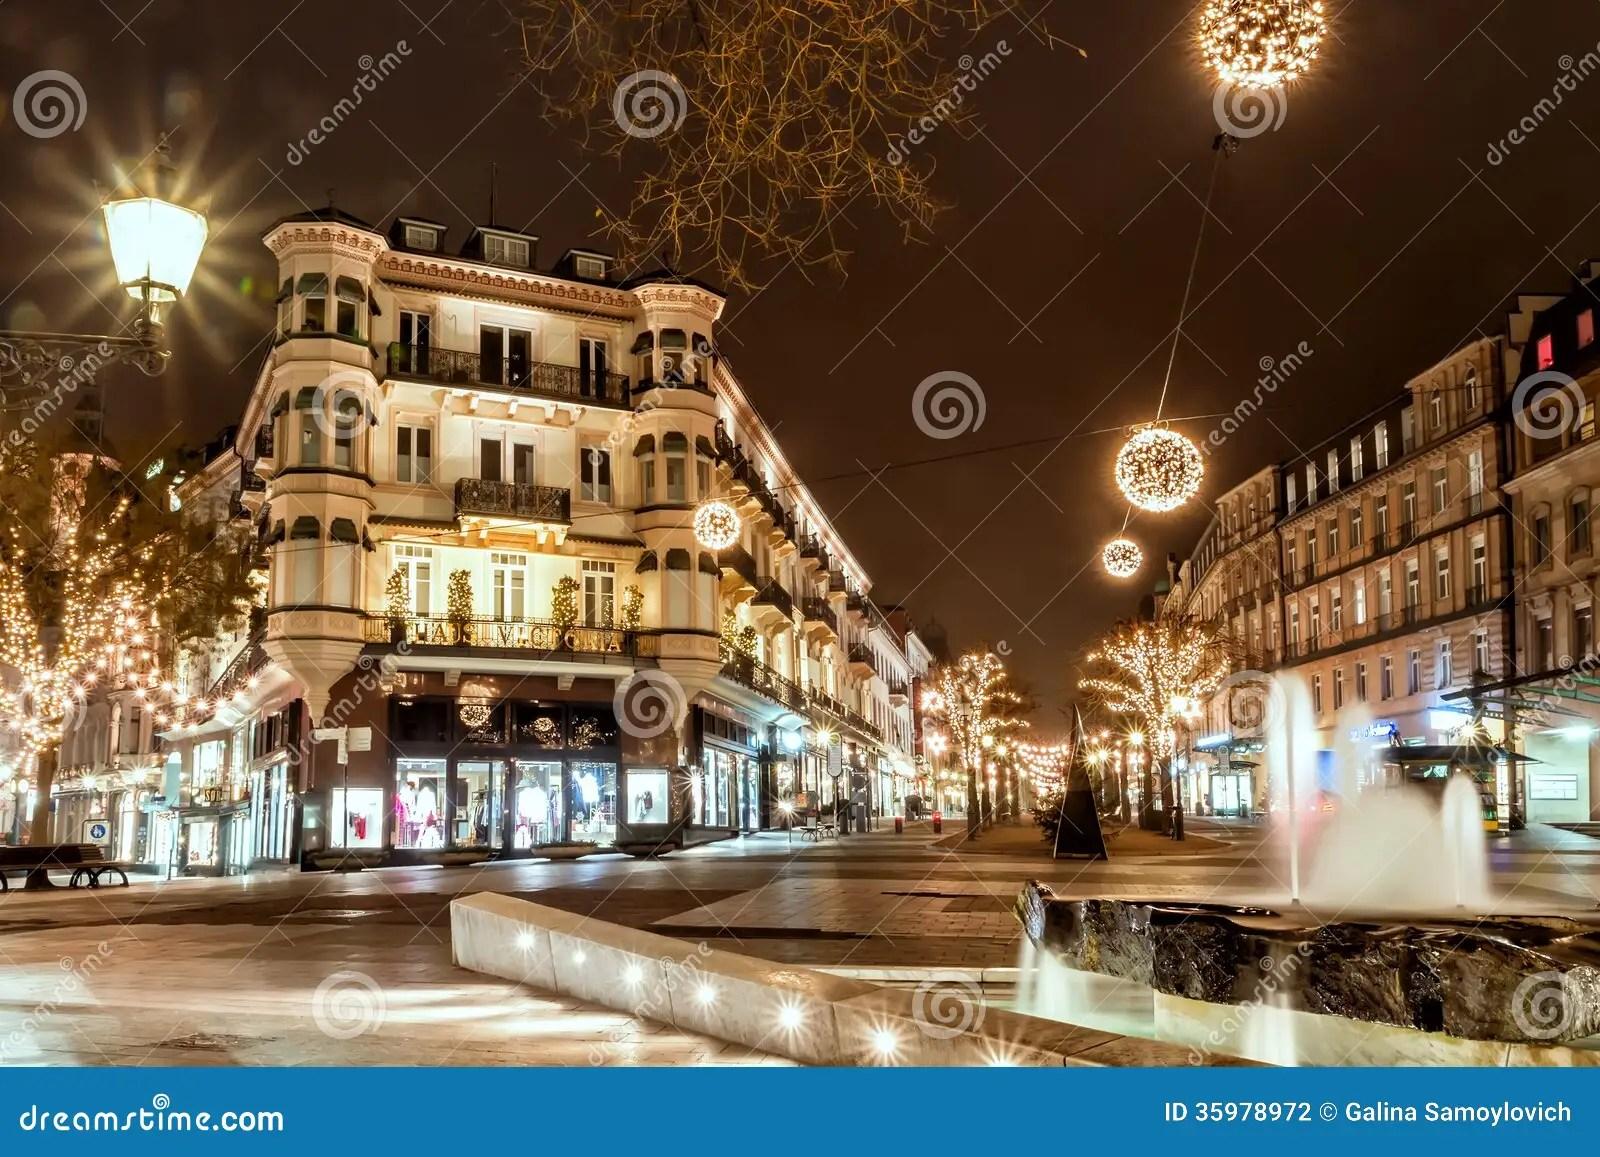 BADEN BADEN GERMANY DECEMBER 11 CITY CHRISTMAS